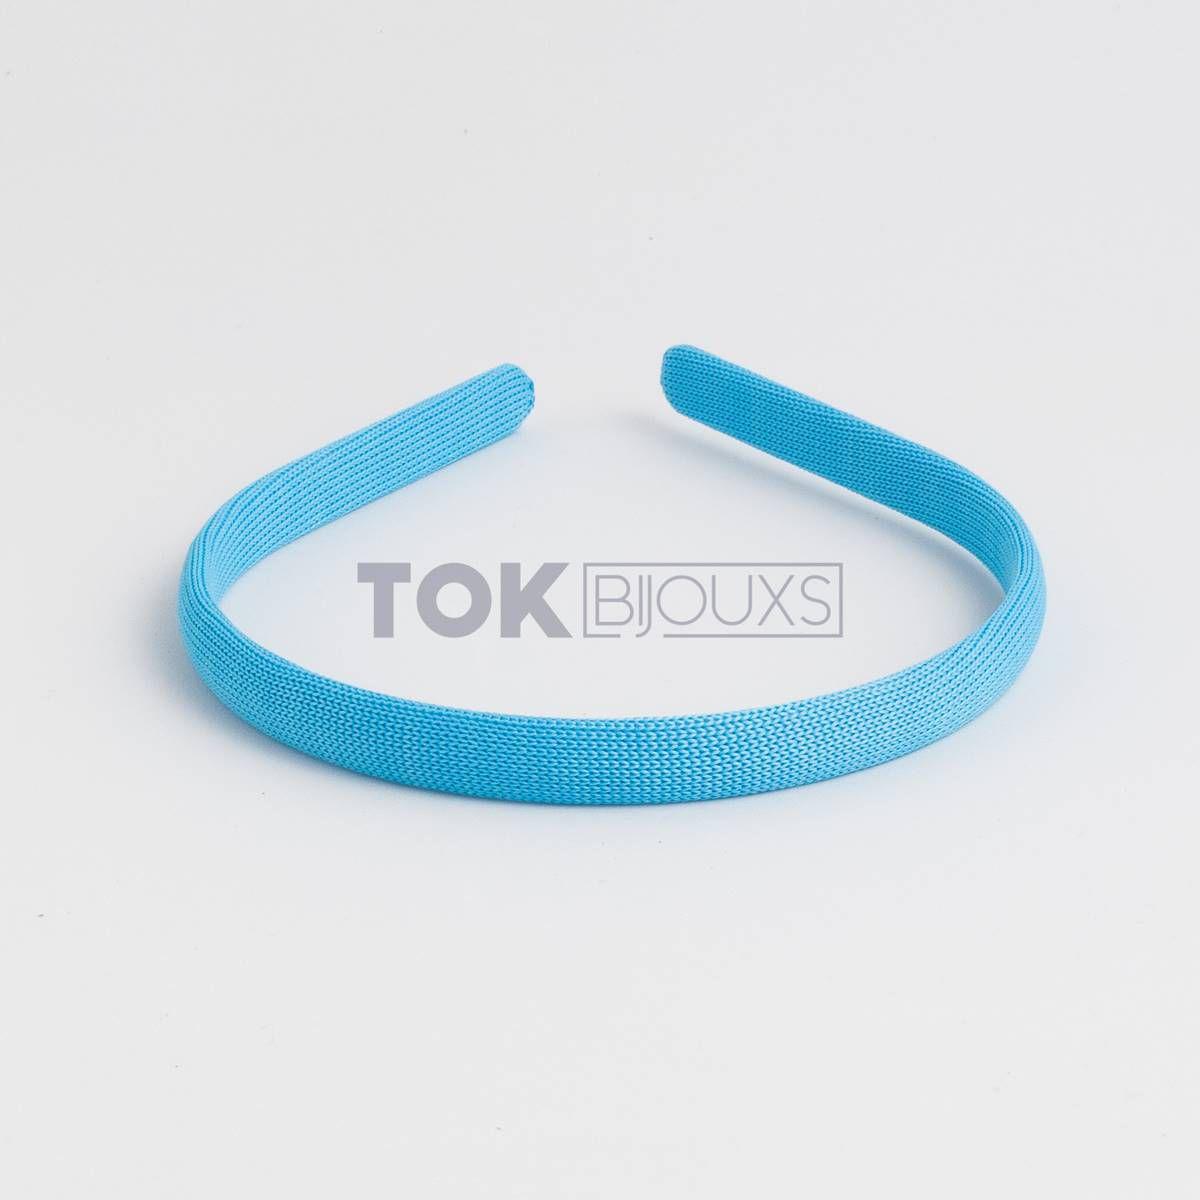 Tiaras Encapadas 10mm - Azul Turquesa - 12Unid